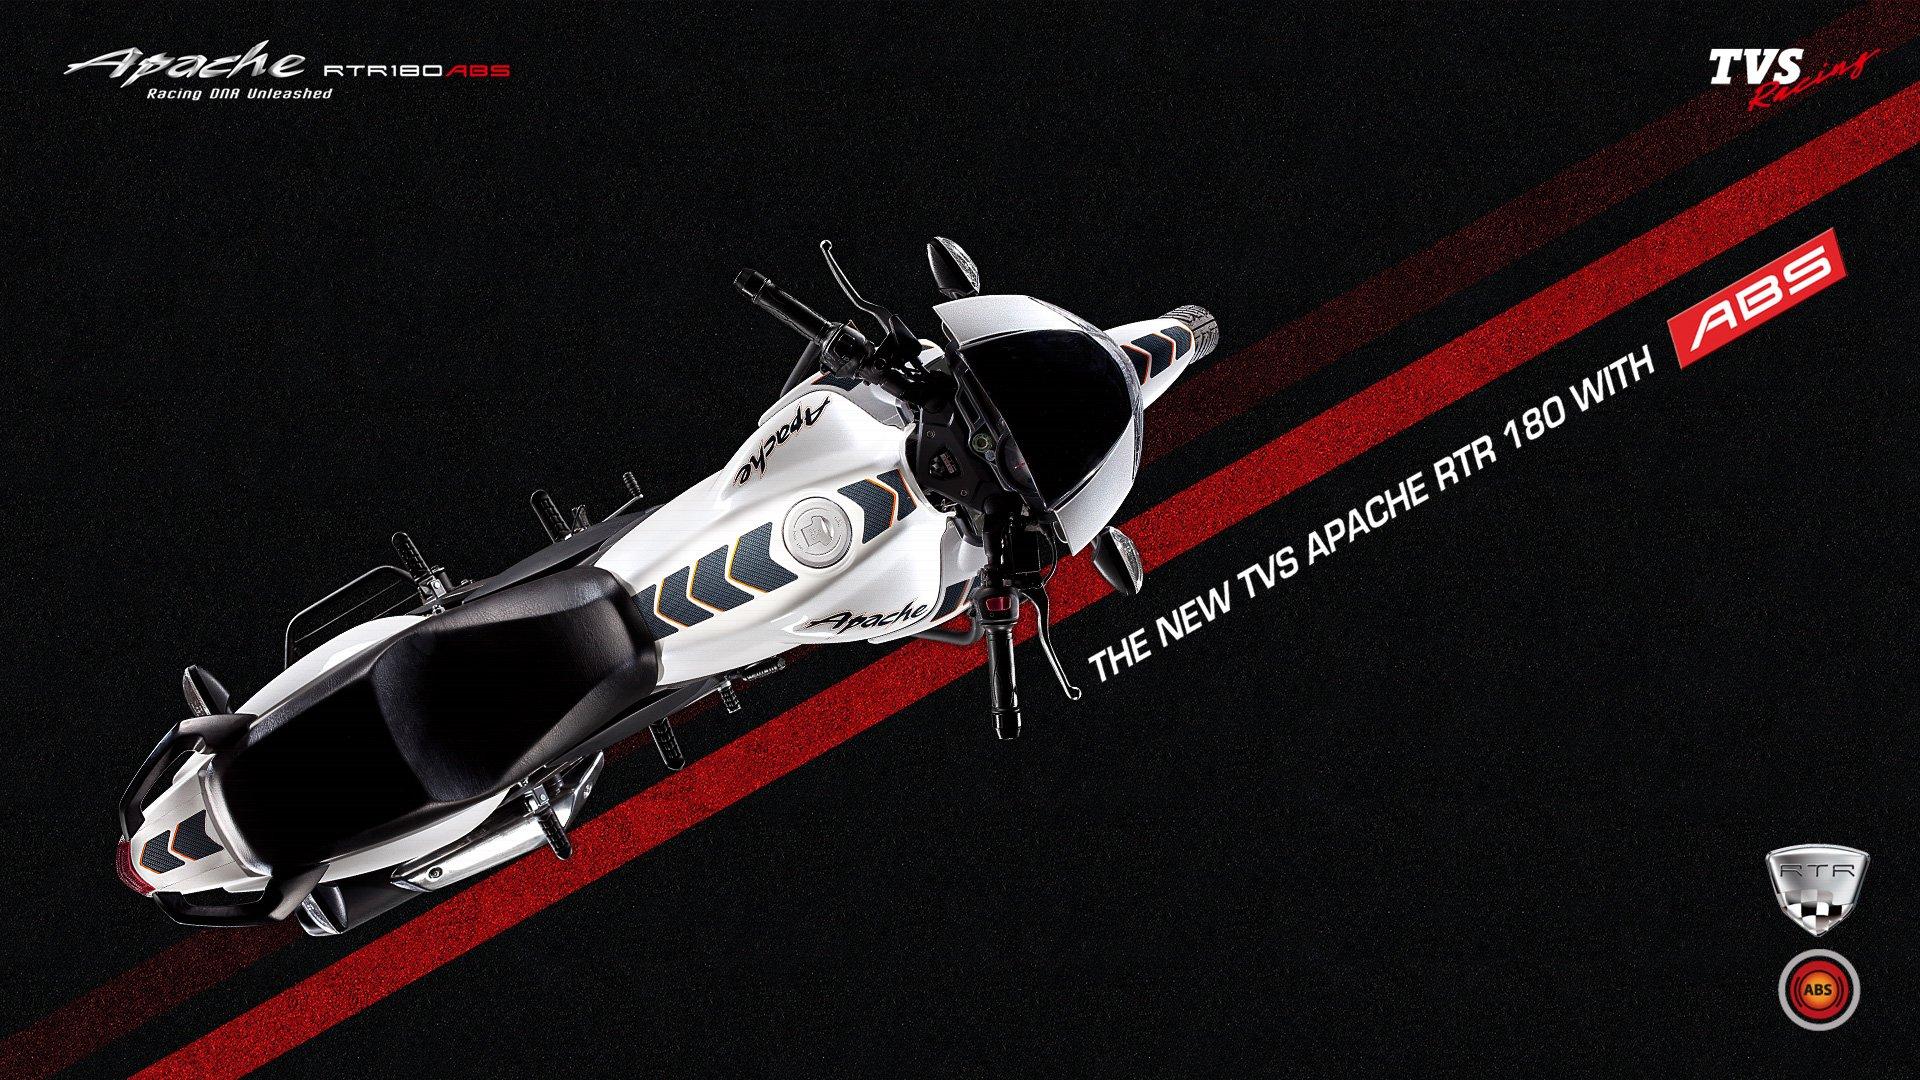 Tvs Apache Rtr Fi Wallpapers Bikessale 1920x1080